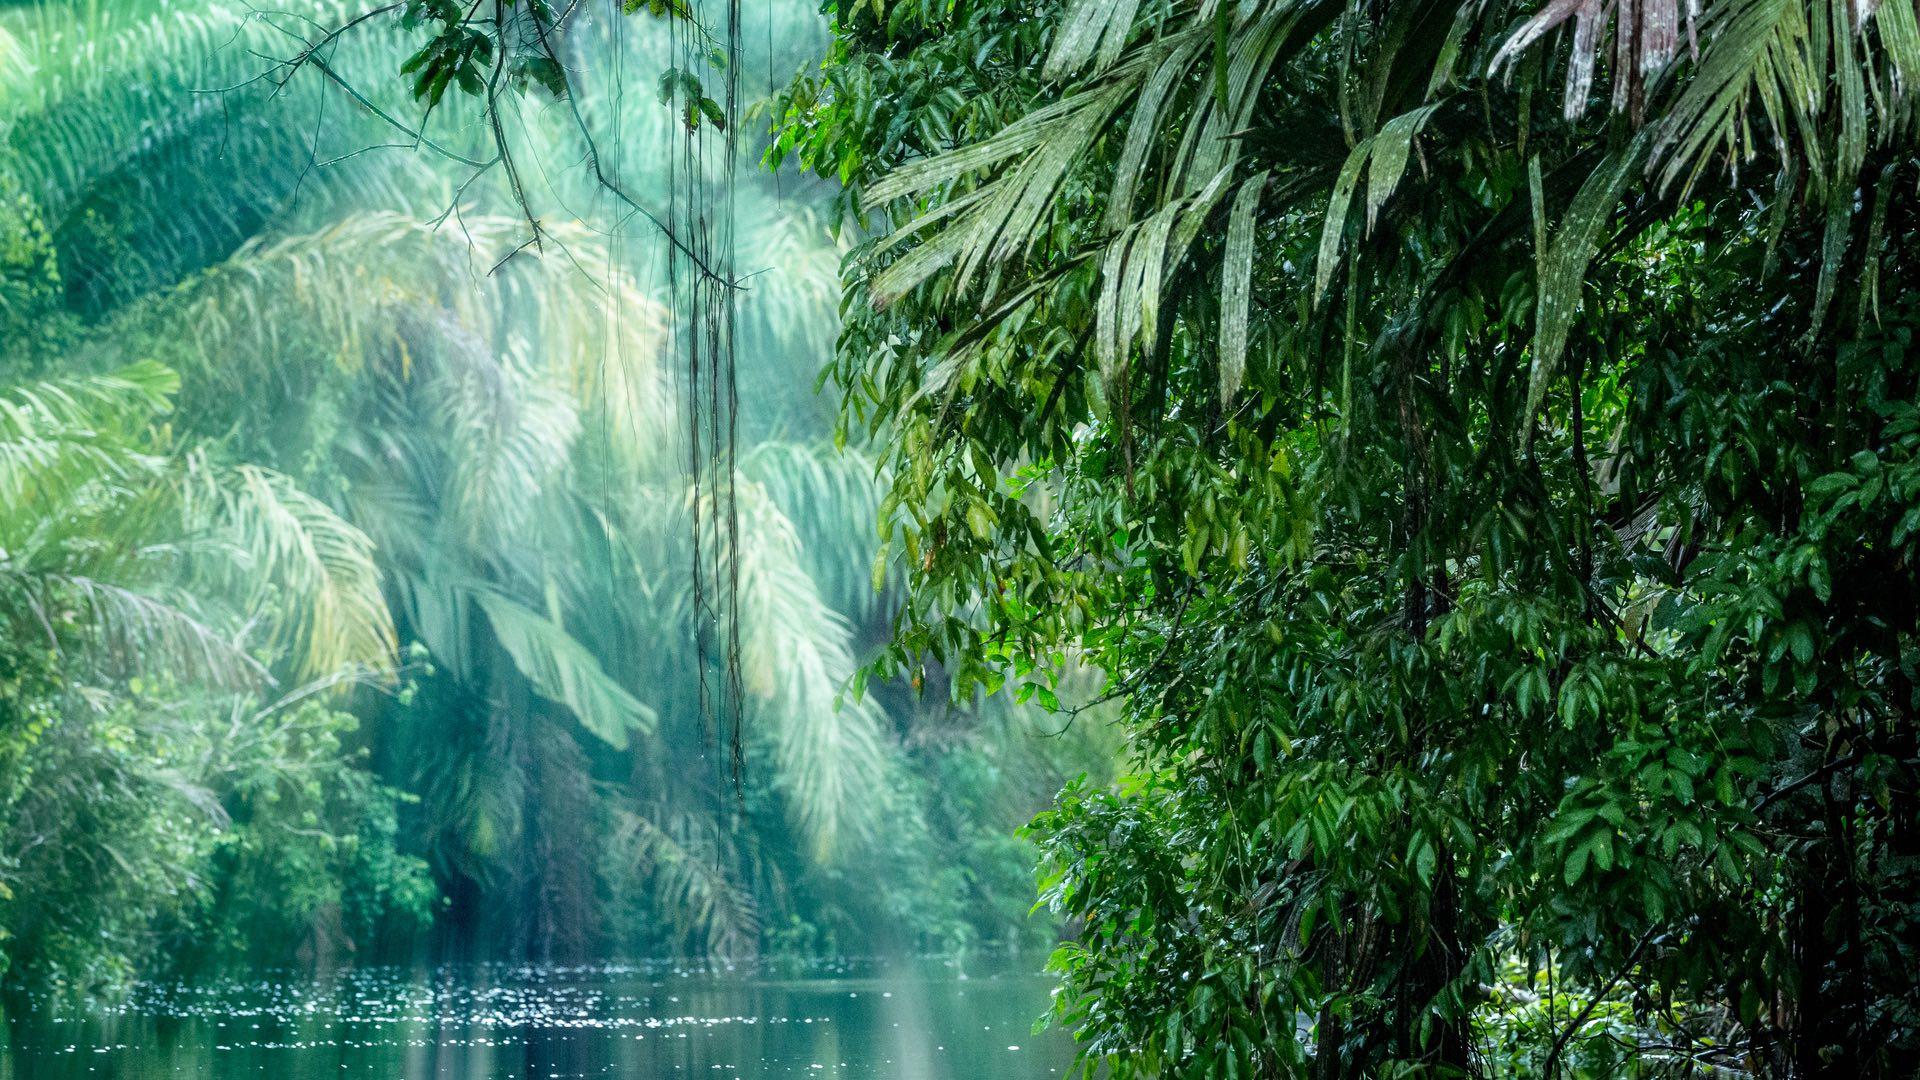 Costa Rica | Regenwald | ©ronnybas/shutterstock.com